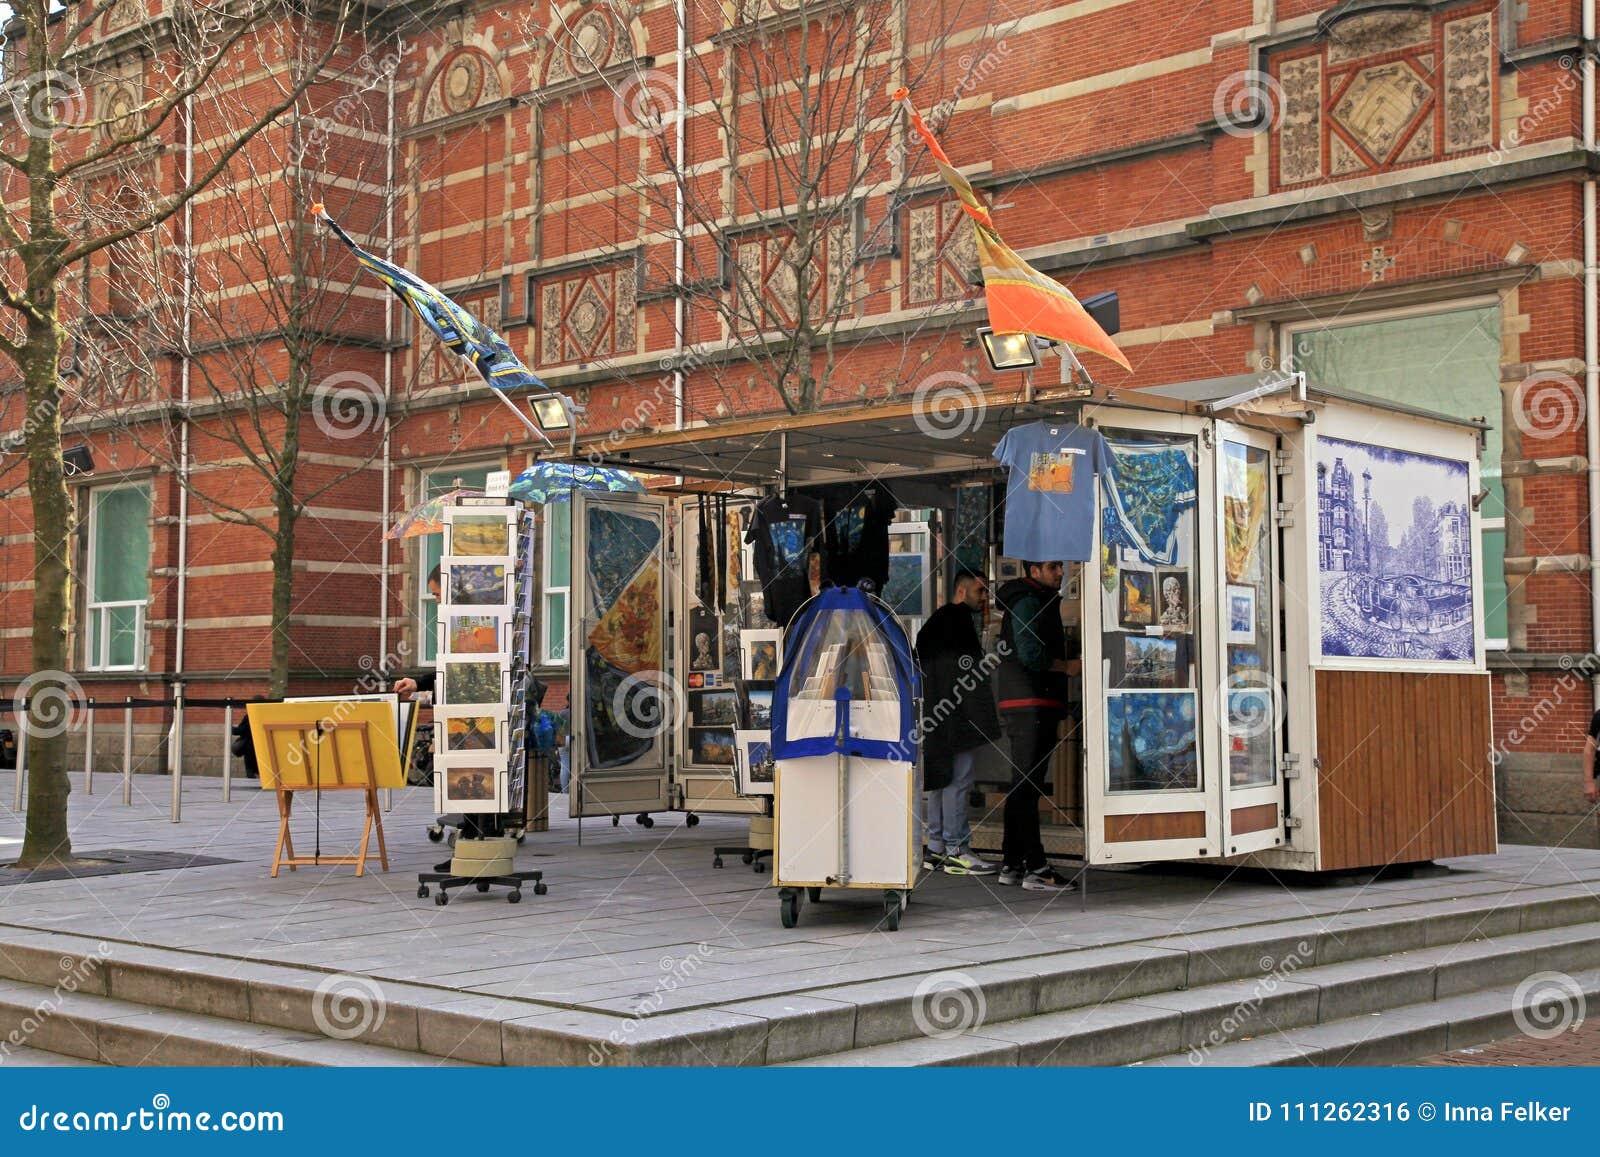 Souvenir shop in museum district, Amsterdam, Netherlands.